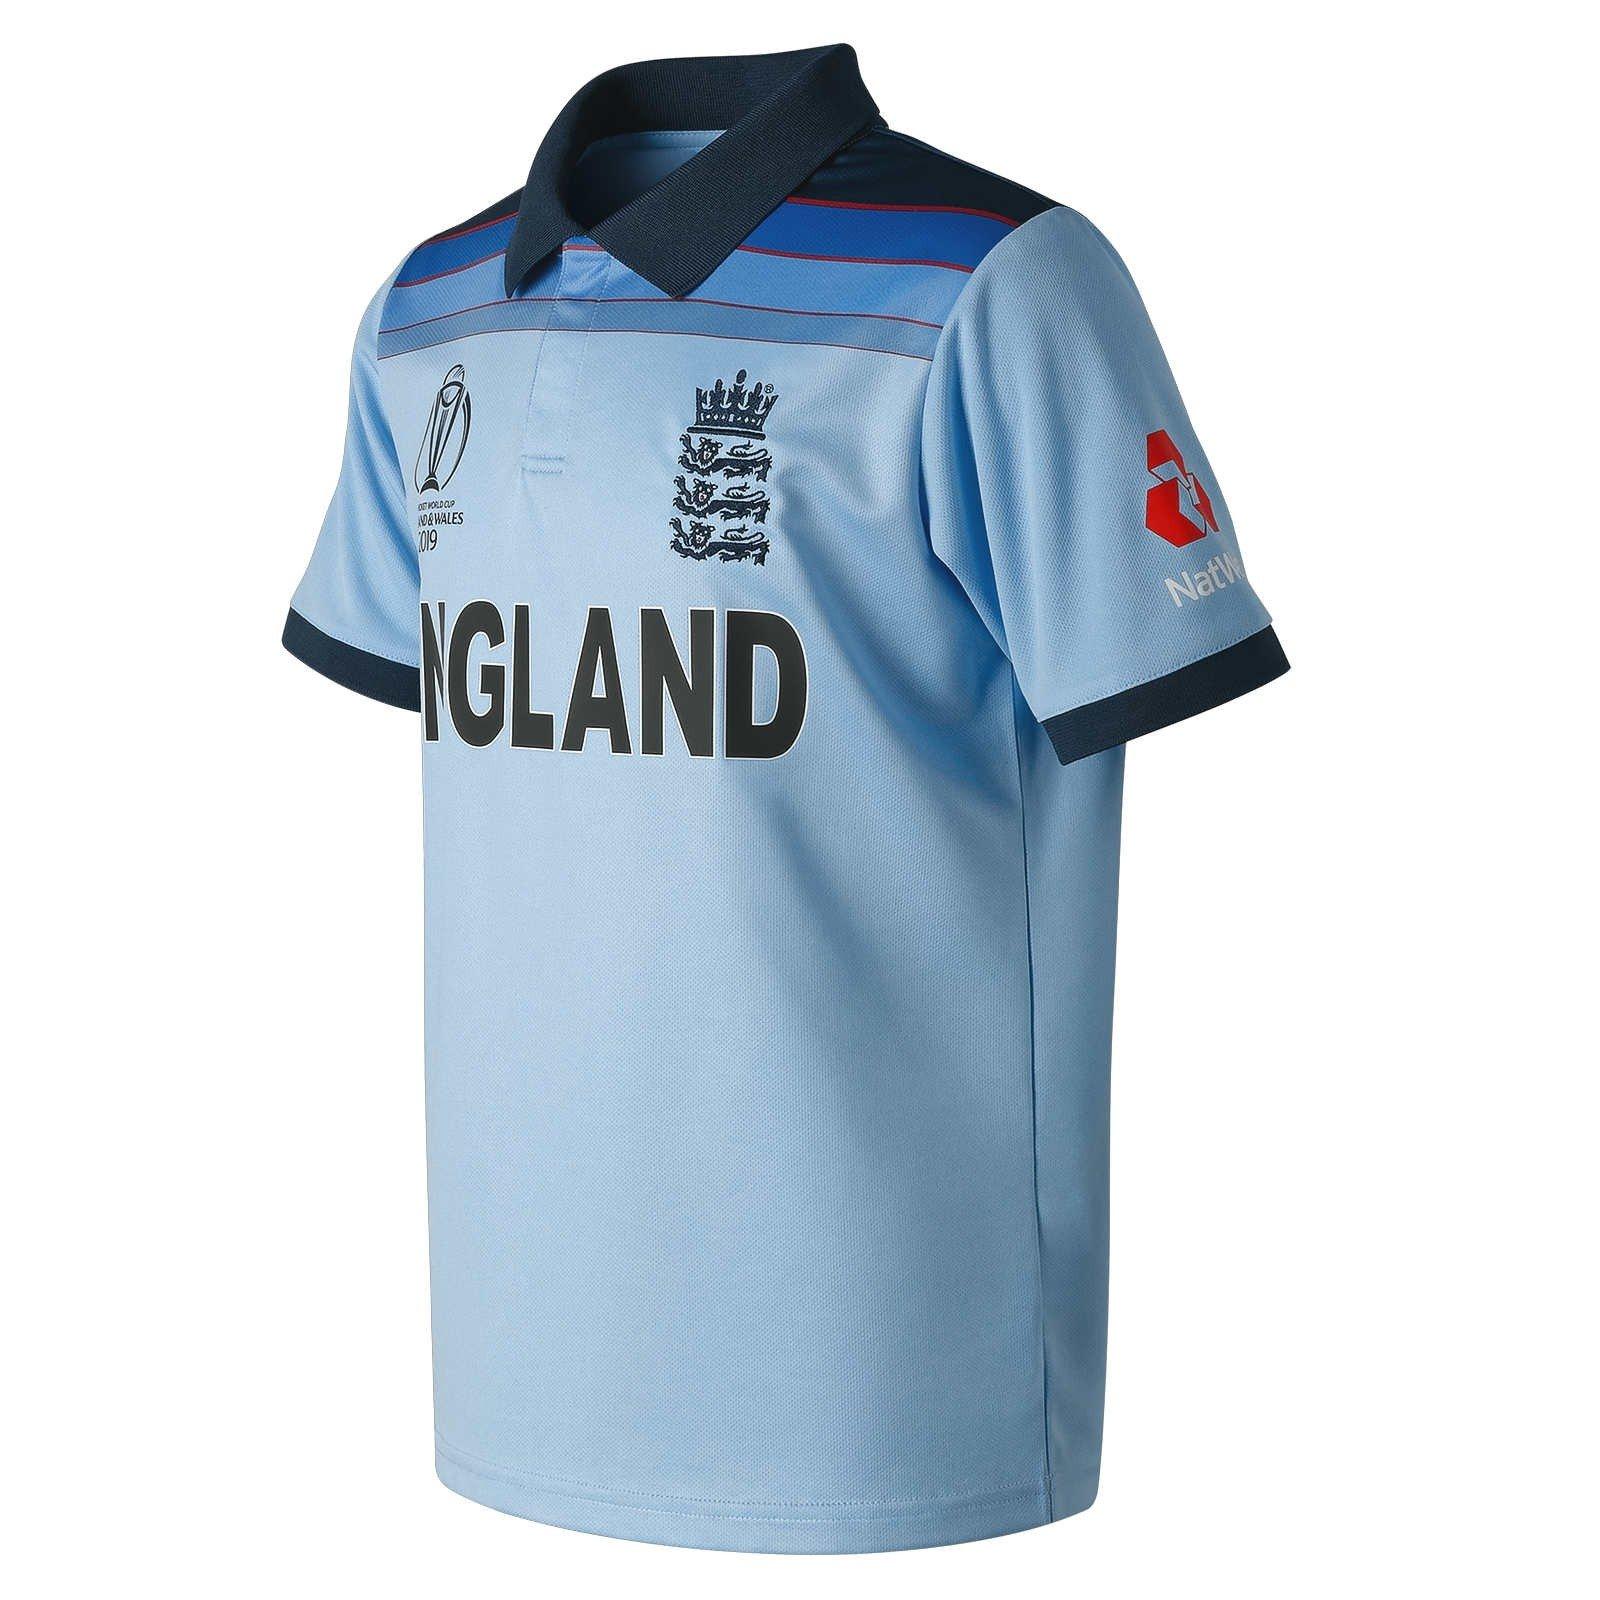 new product 6d639 3a688 2019 New Balance England Cricket World Cup Winners ODI Replica Junior